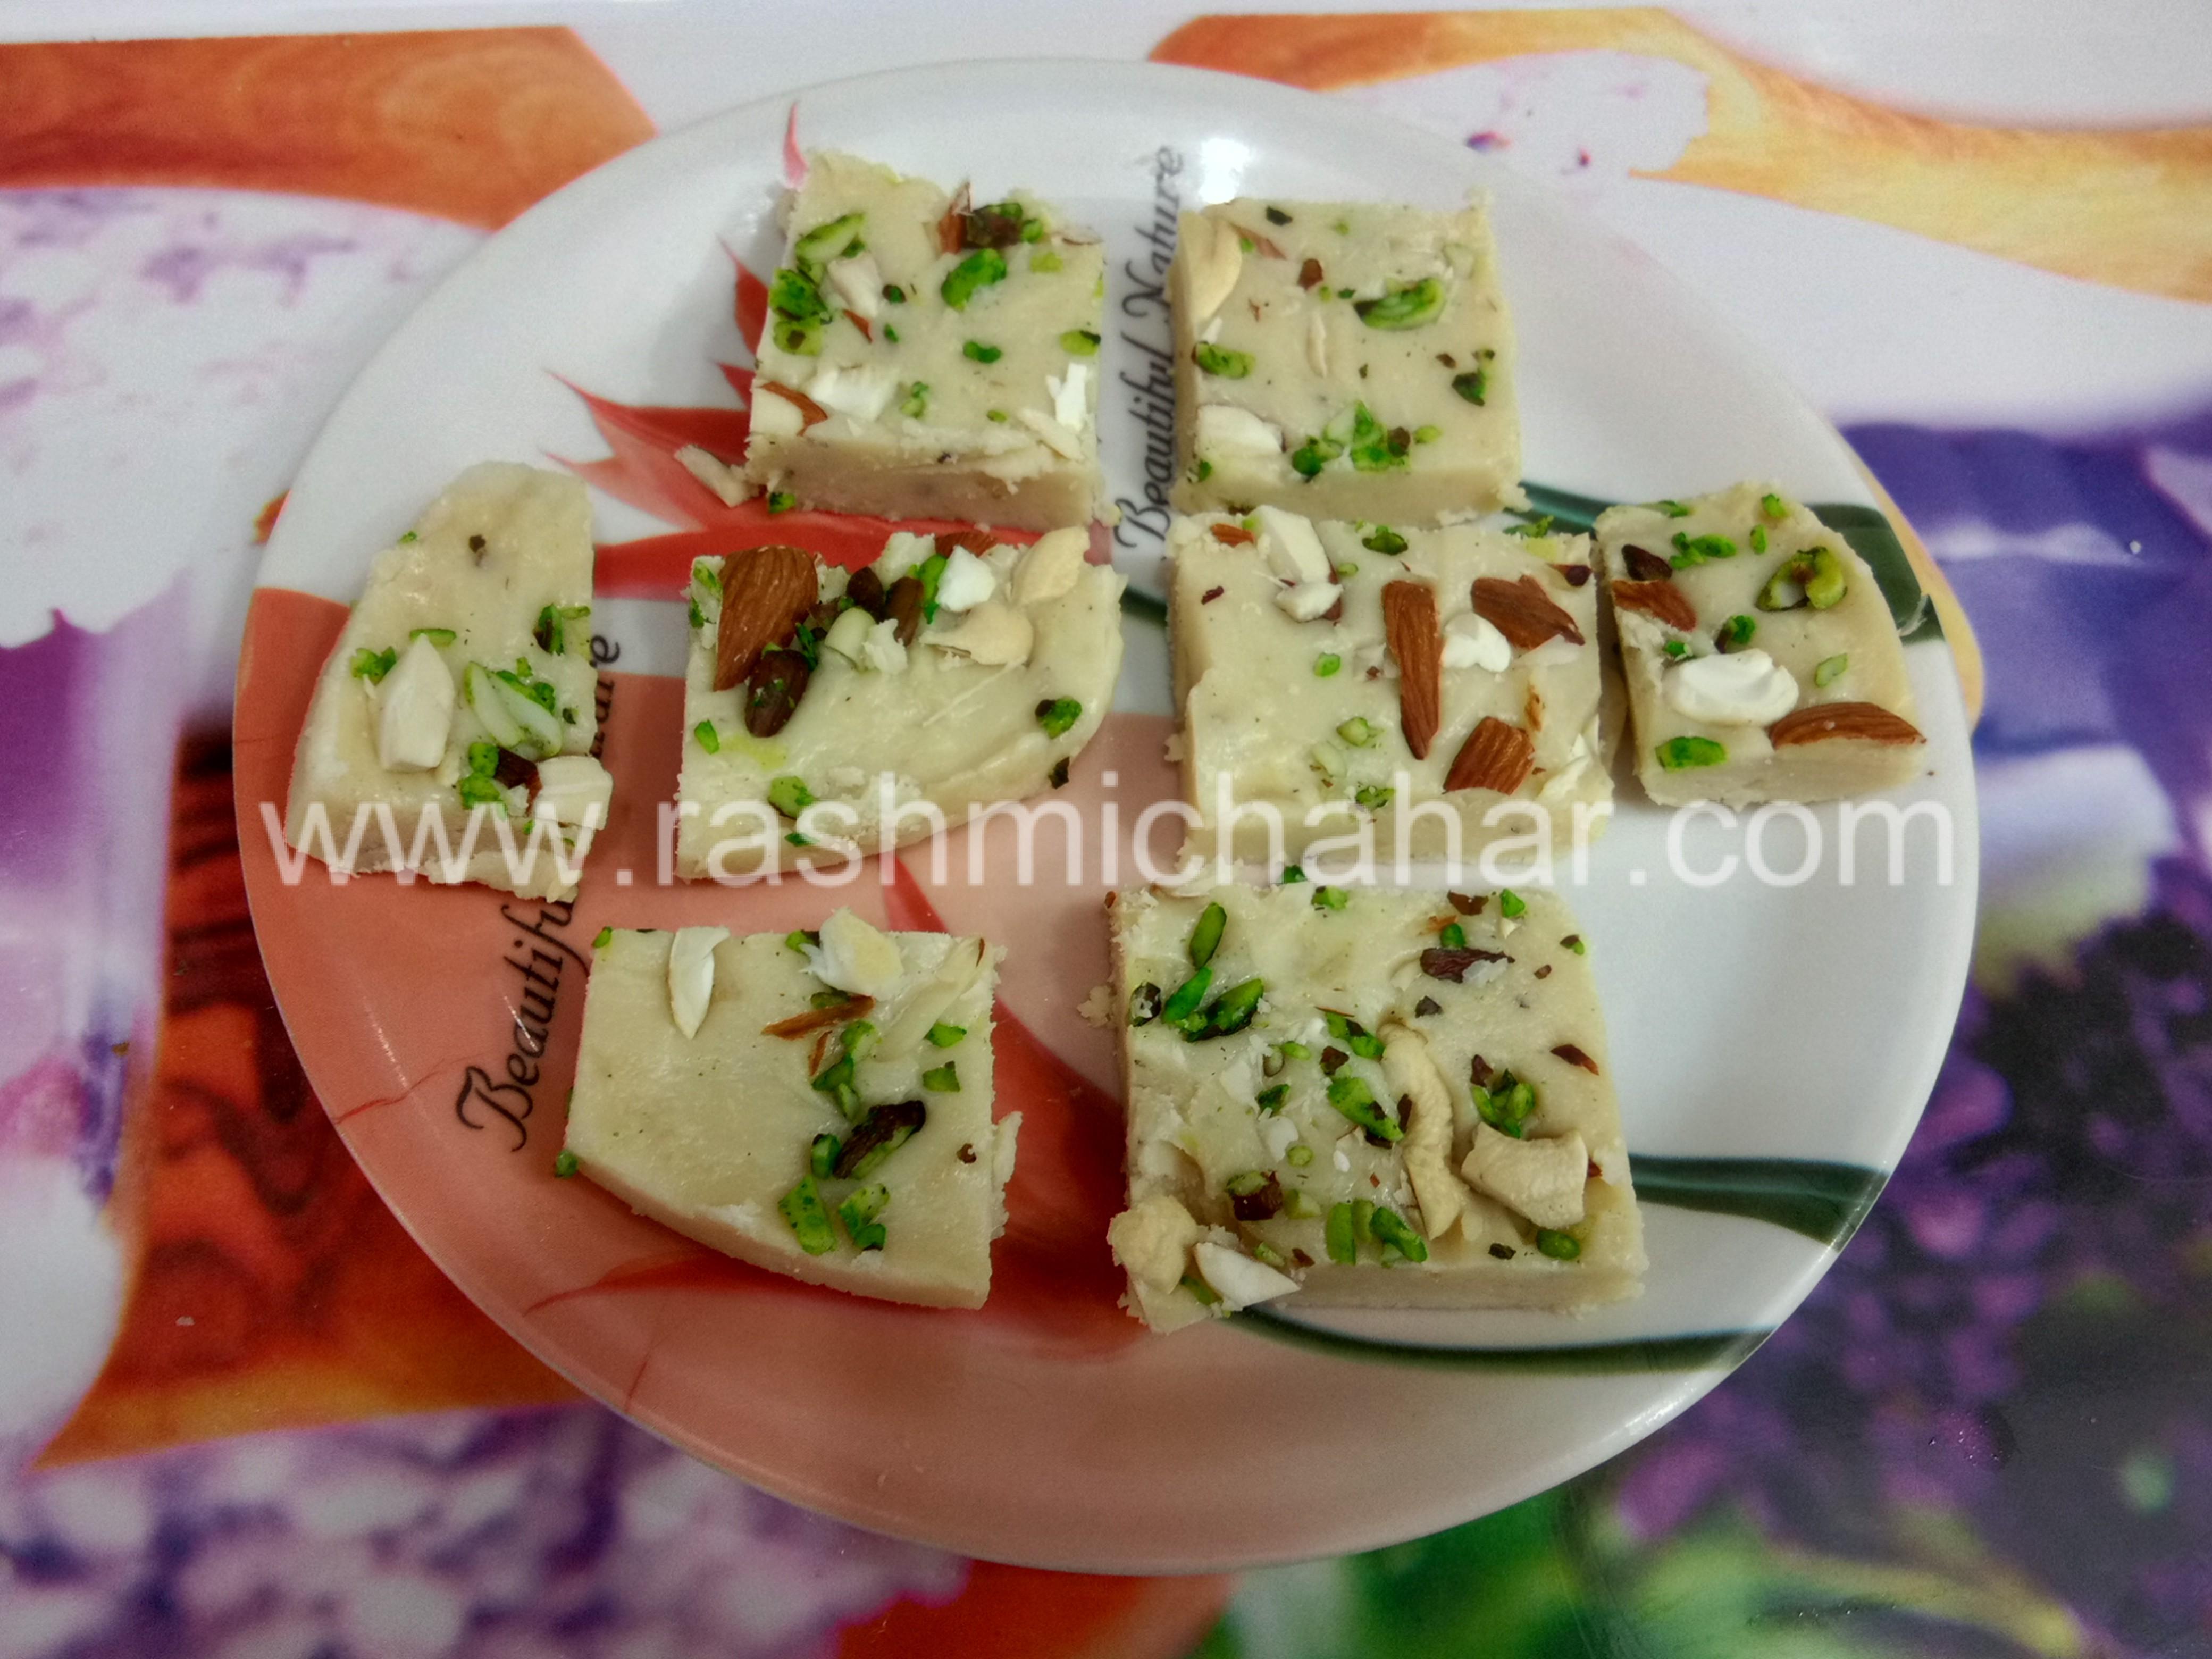 मावा की बर्फी बनाना | Mawa Barfi Recipe | How To Make Mawa Barfi